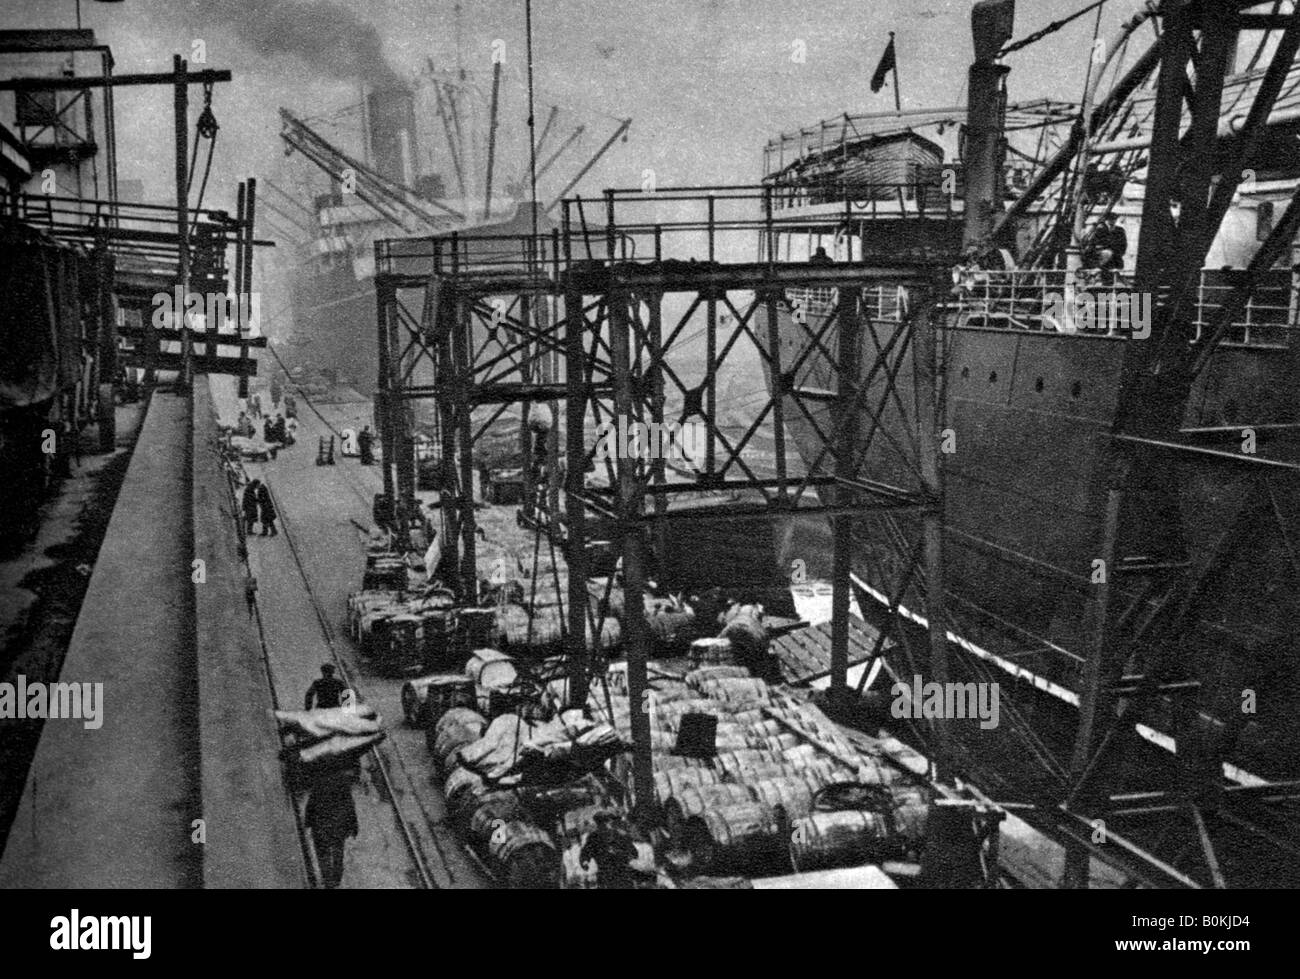 Merchant ships in the Royal Albert Dock, London, 1926-1927. - Stock Image